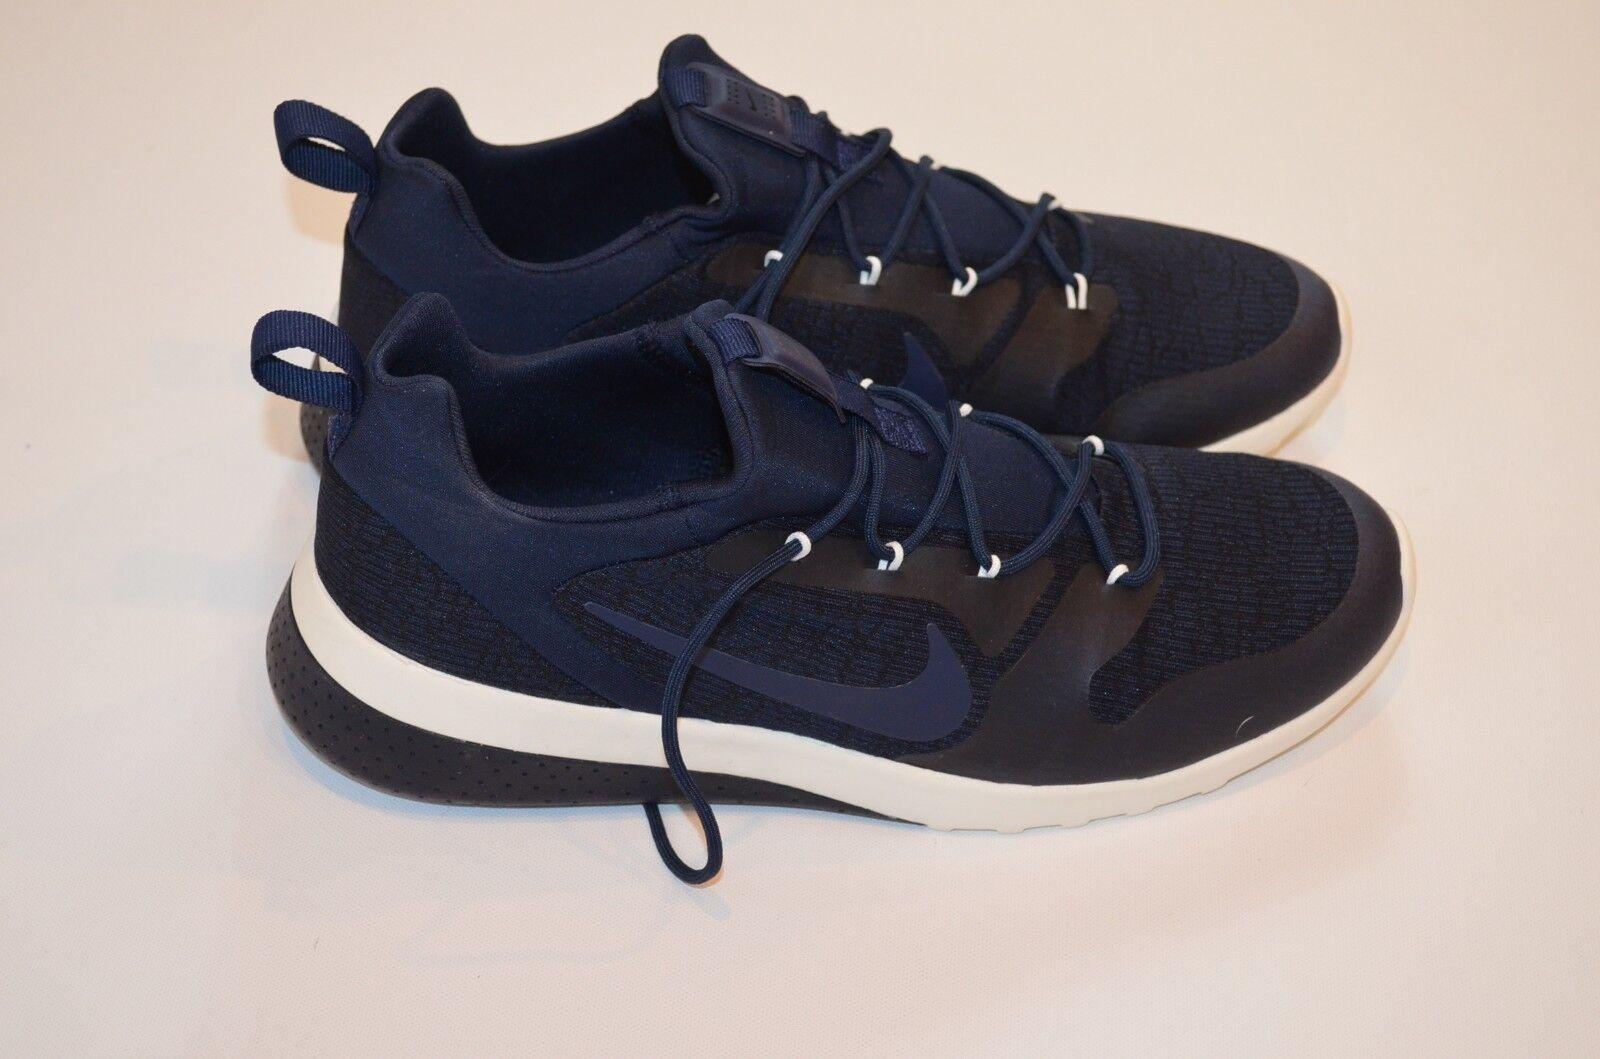 New Men's Nike CK Racer Athletic Training Shoes Obsidian Blue Black sz 9 Running